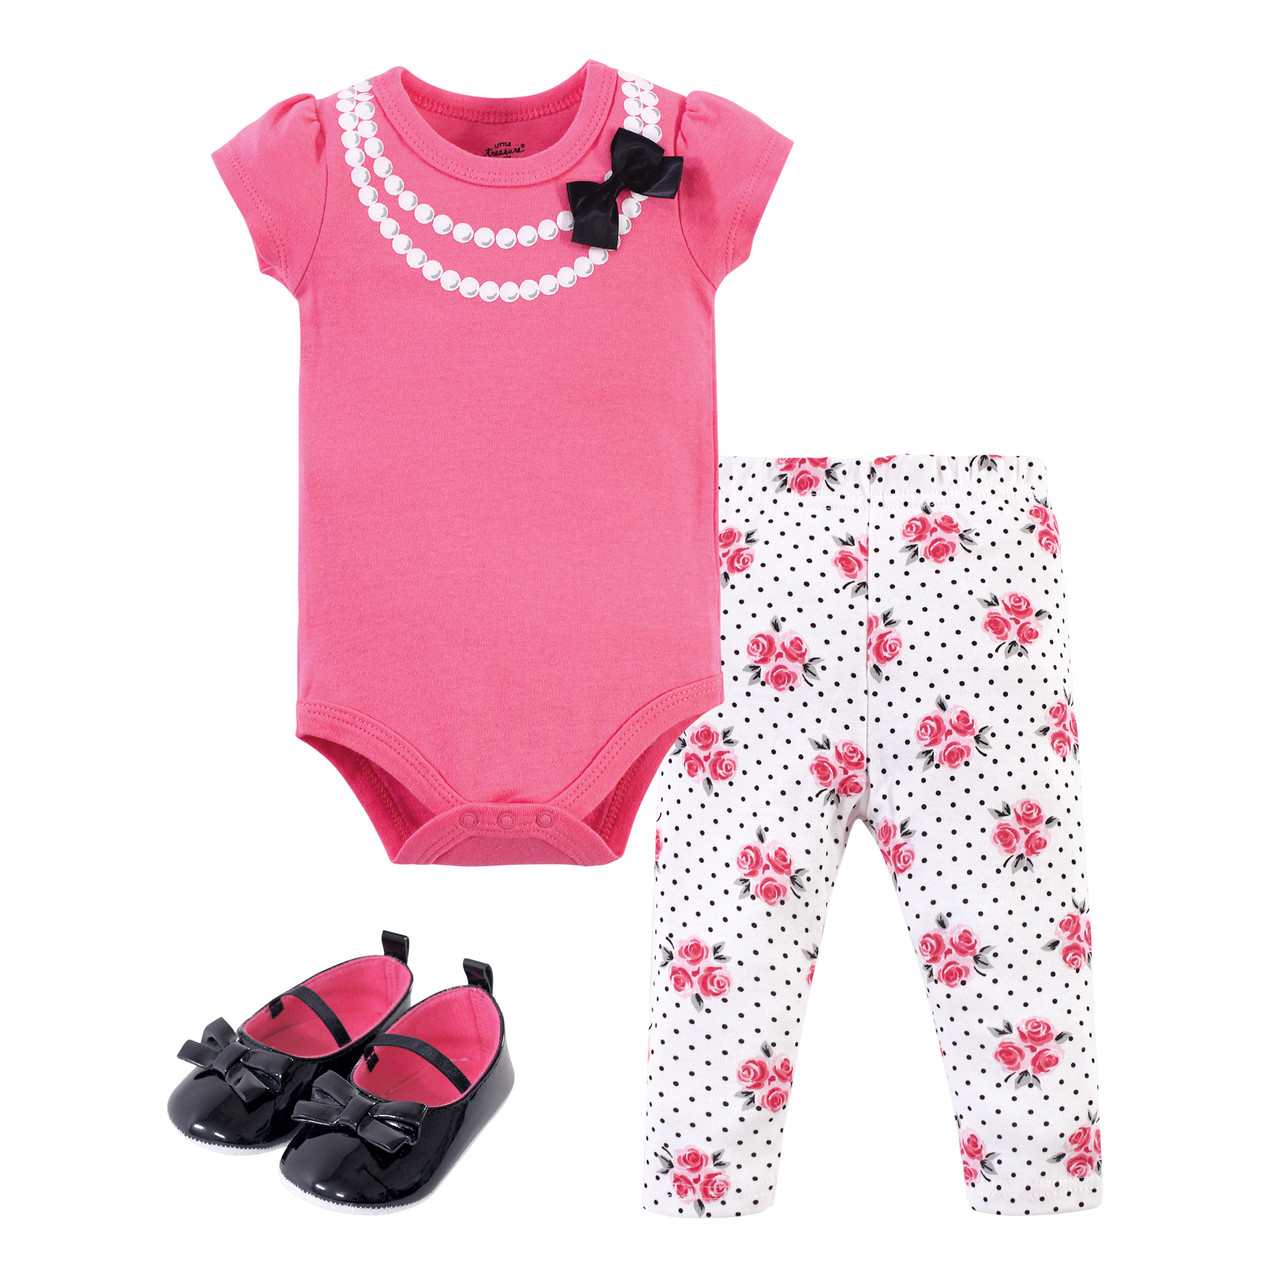 Party Pearls Little Treasure Bodysuit Pant and Shoe Set